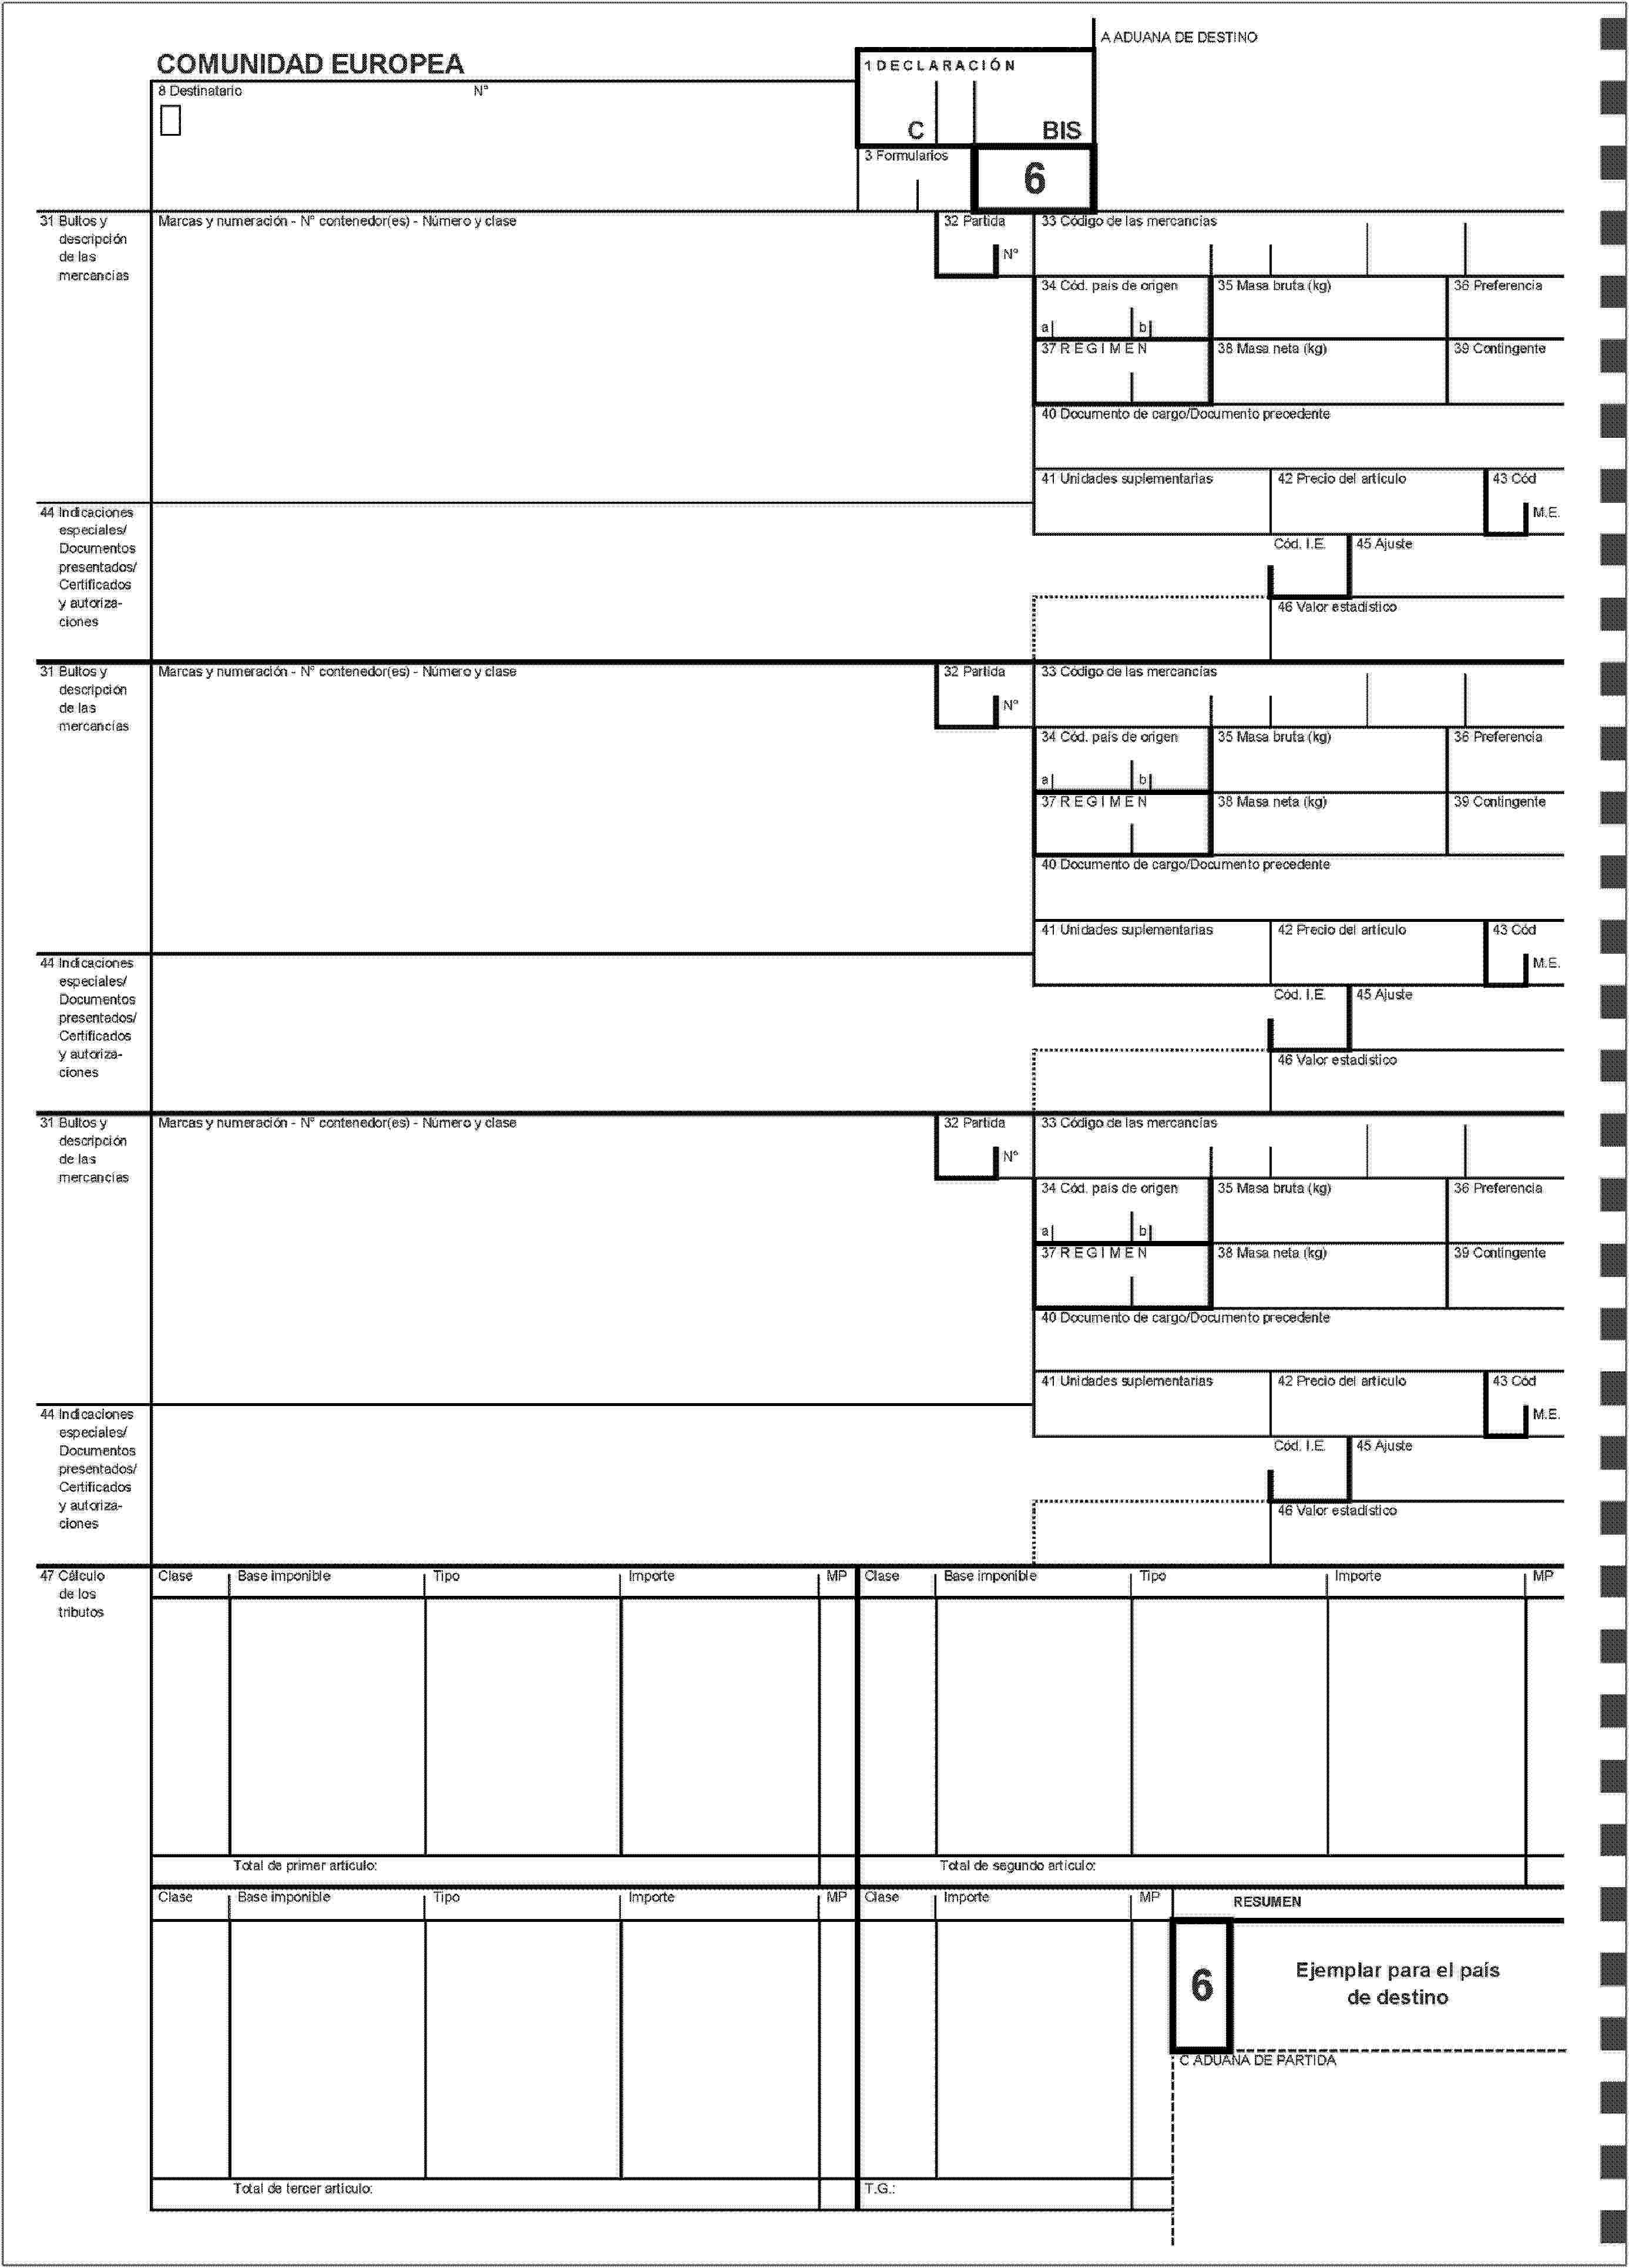 EUR-Lex - 01993R2454-20090101 - EN - EUR-Lex